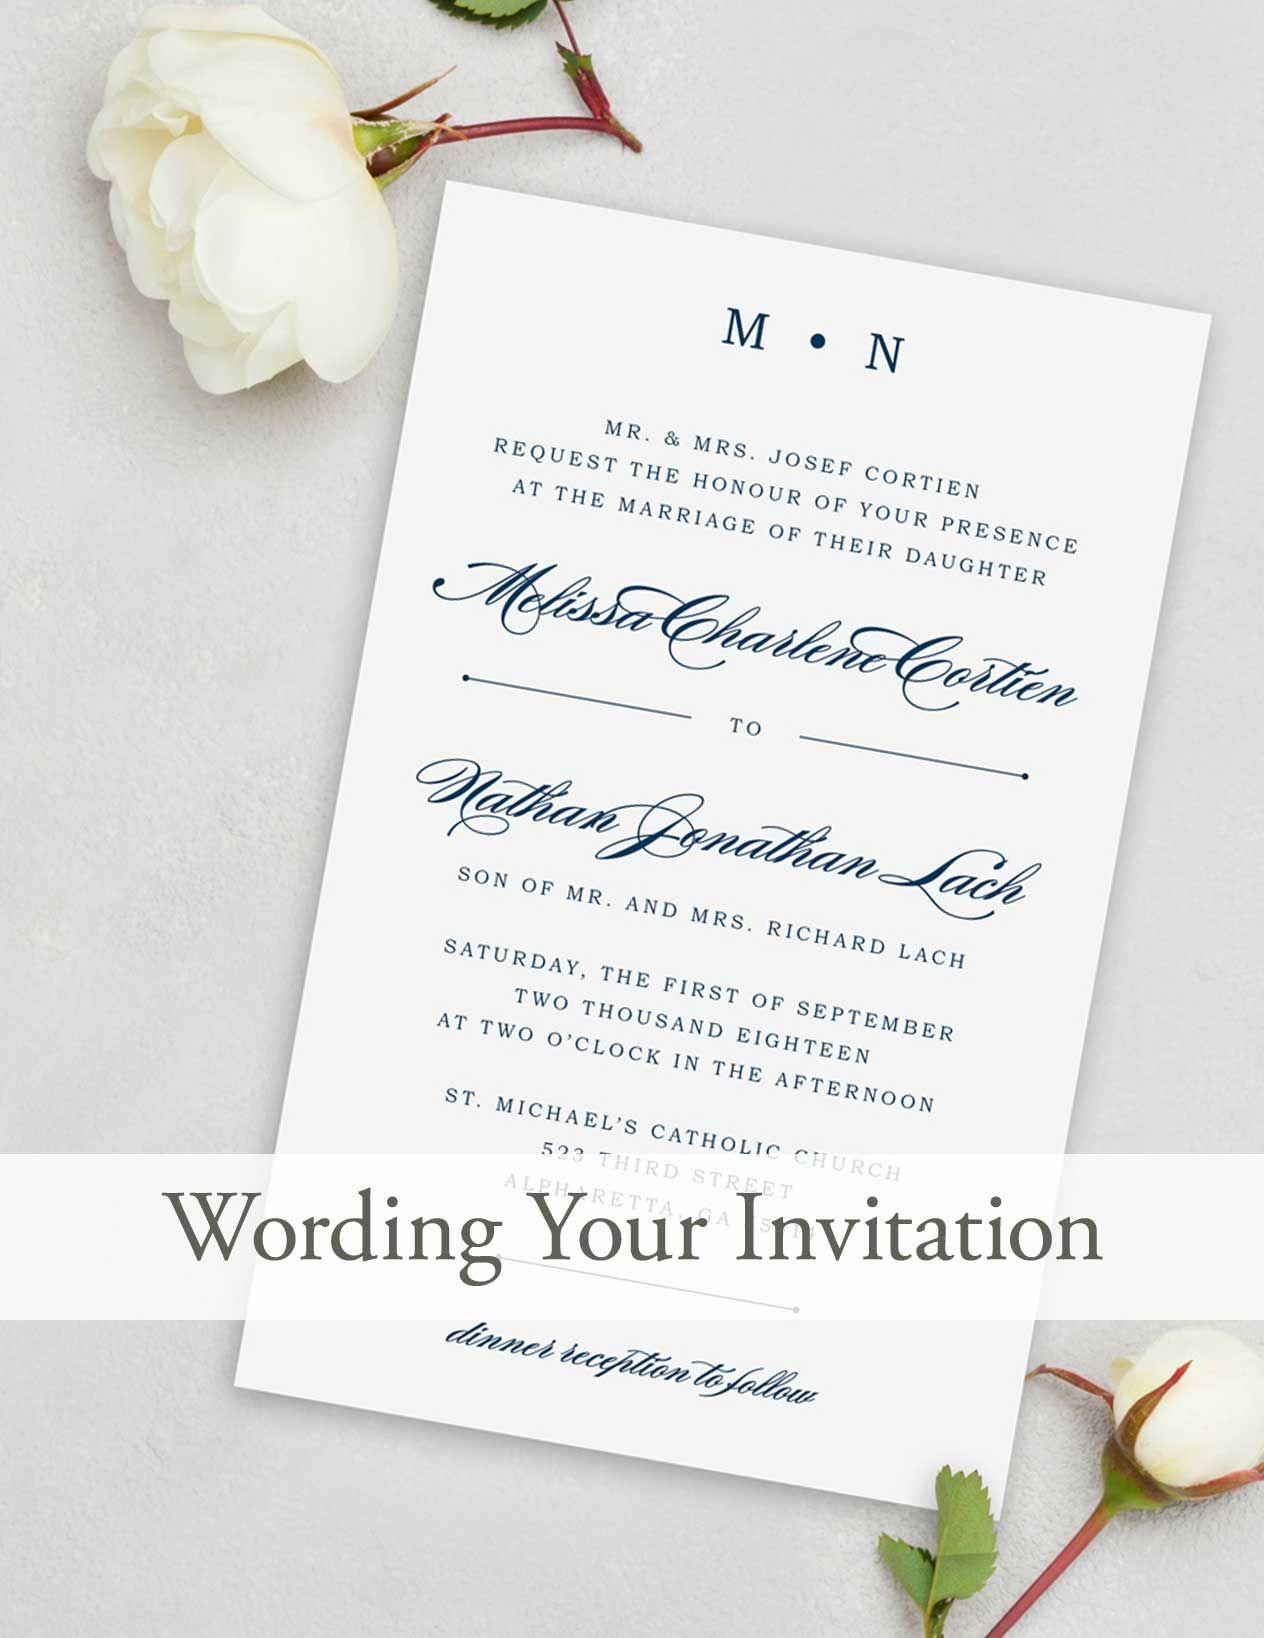 Wedding Invitation Wording | Pinterest | Invitation wording, Wedding ...